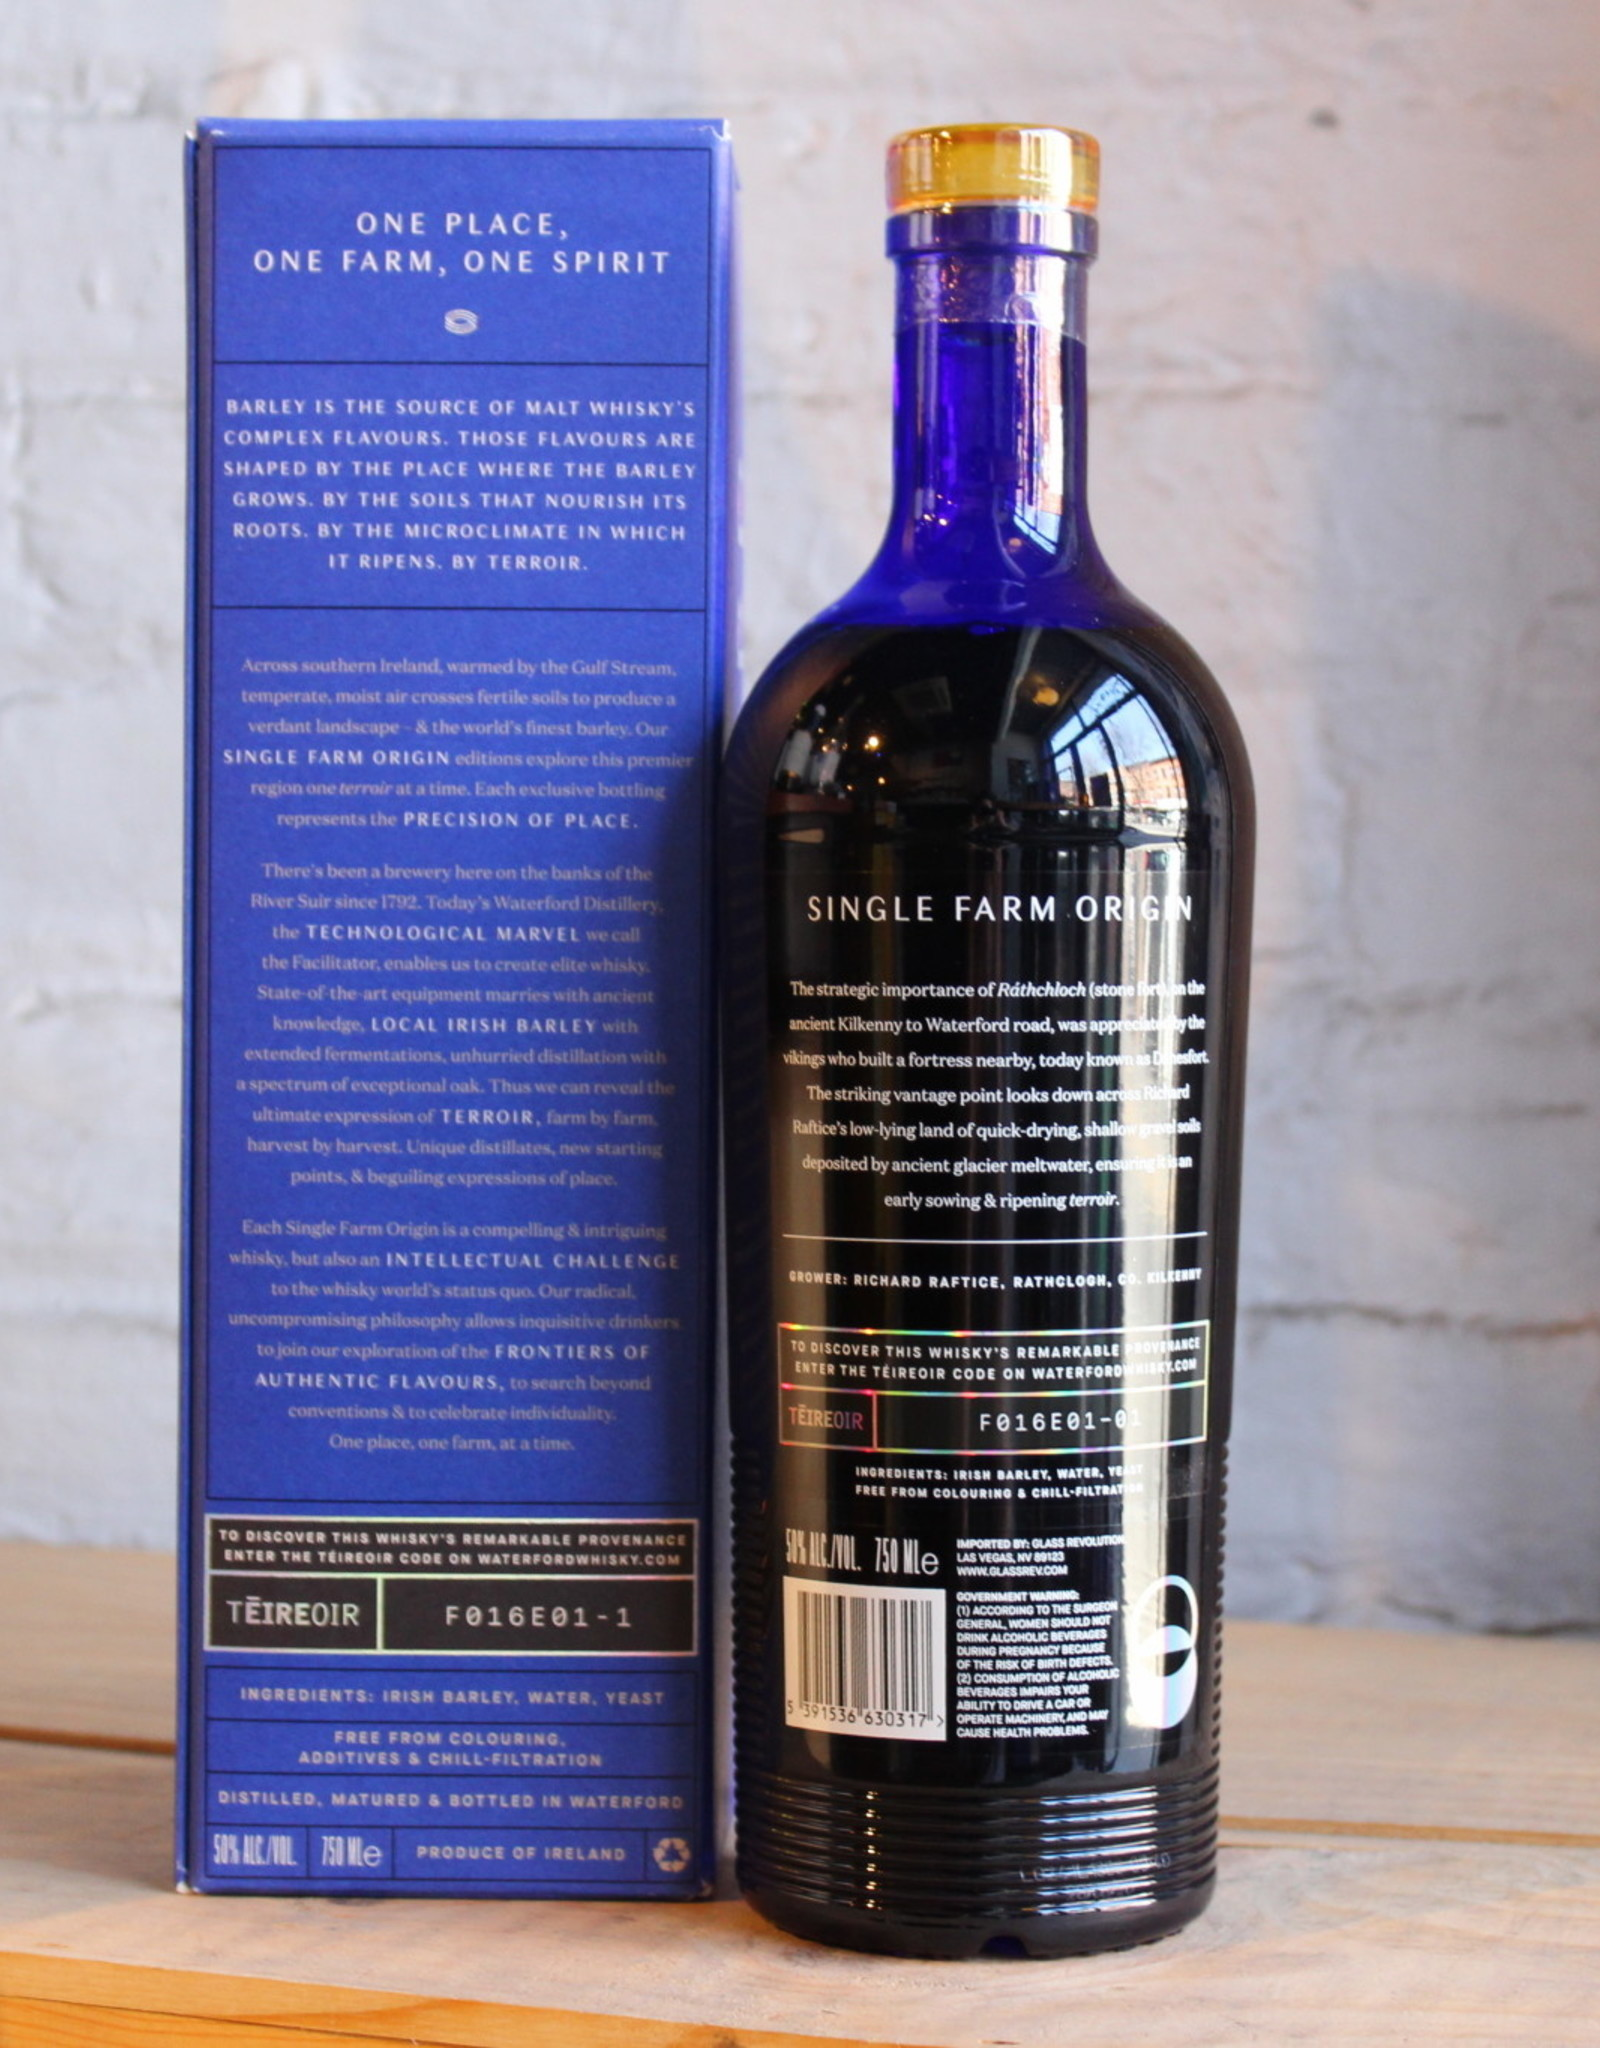 Waterford Distillery Rathclogh Single Farm Origin Irish Single Malt Whisky Edition 1.1 - Ireland  (750ml)